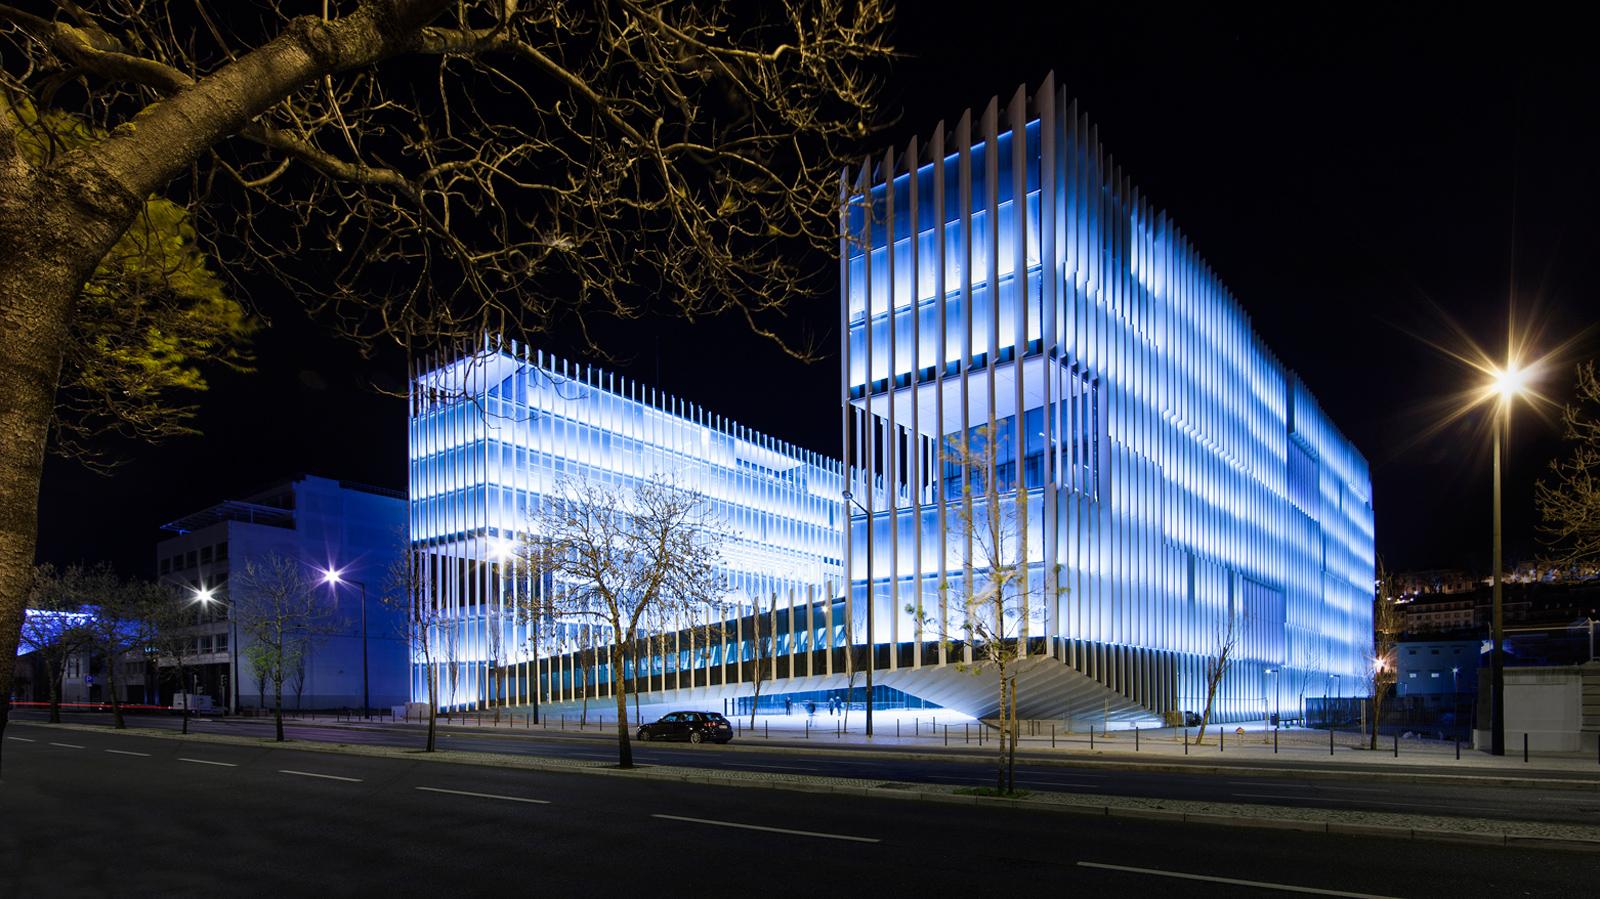 Energias de Portugal headquarters in Lisbon at night